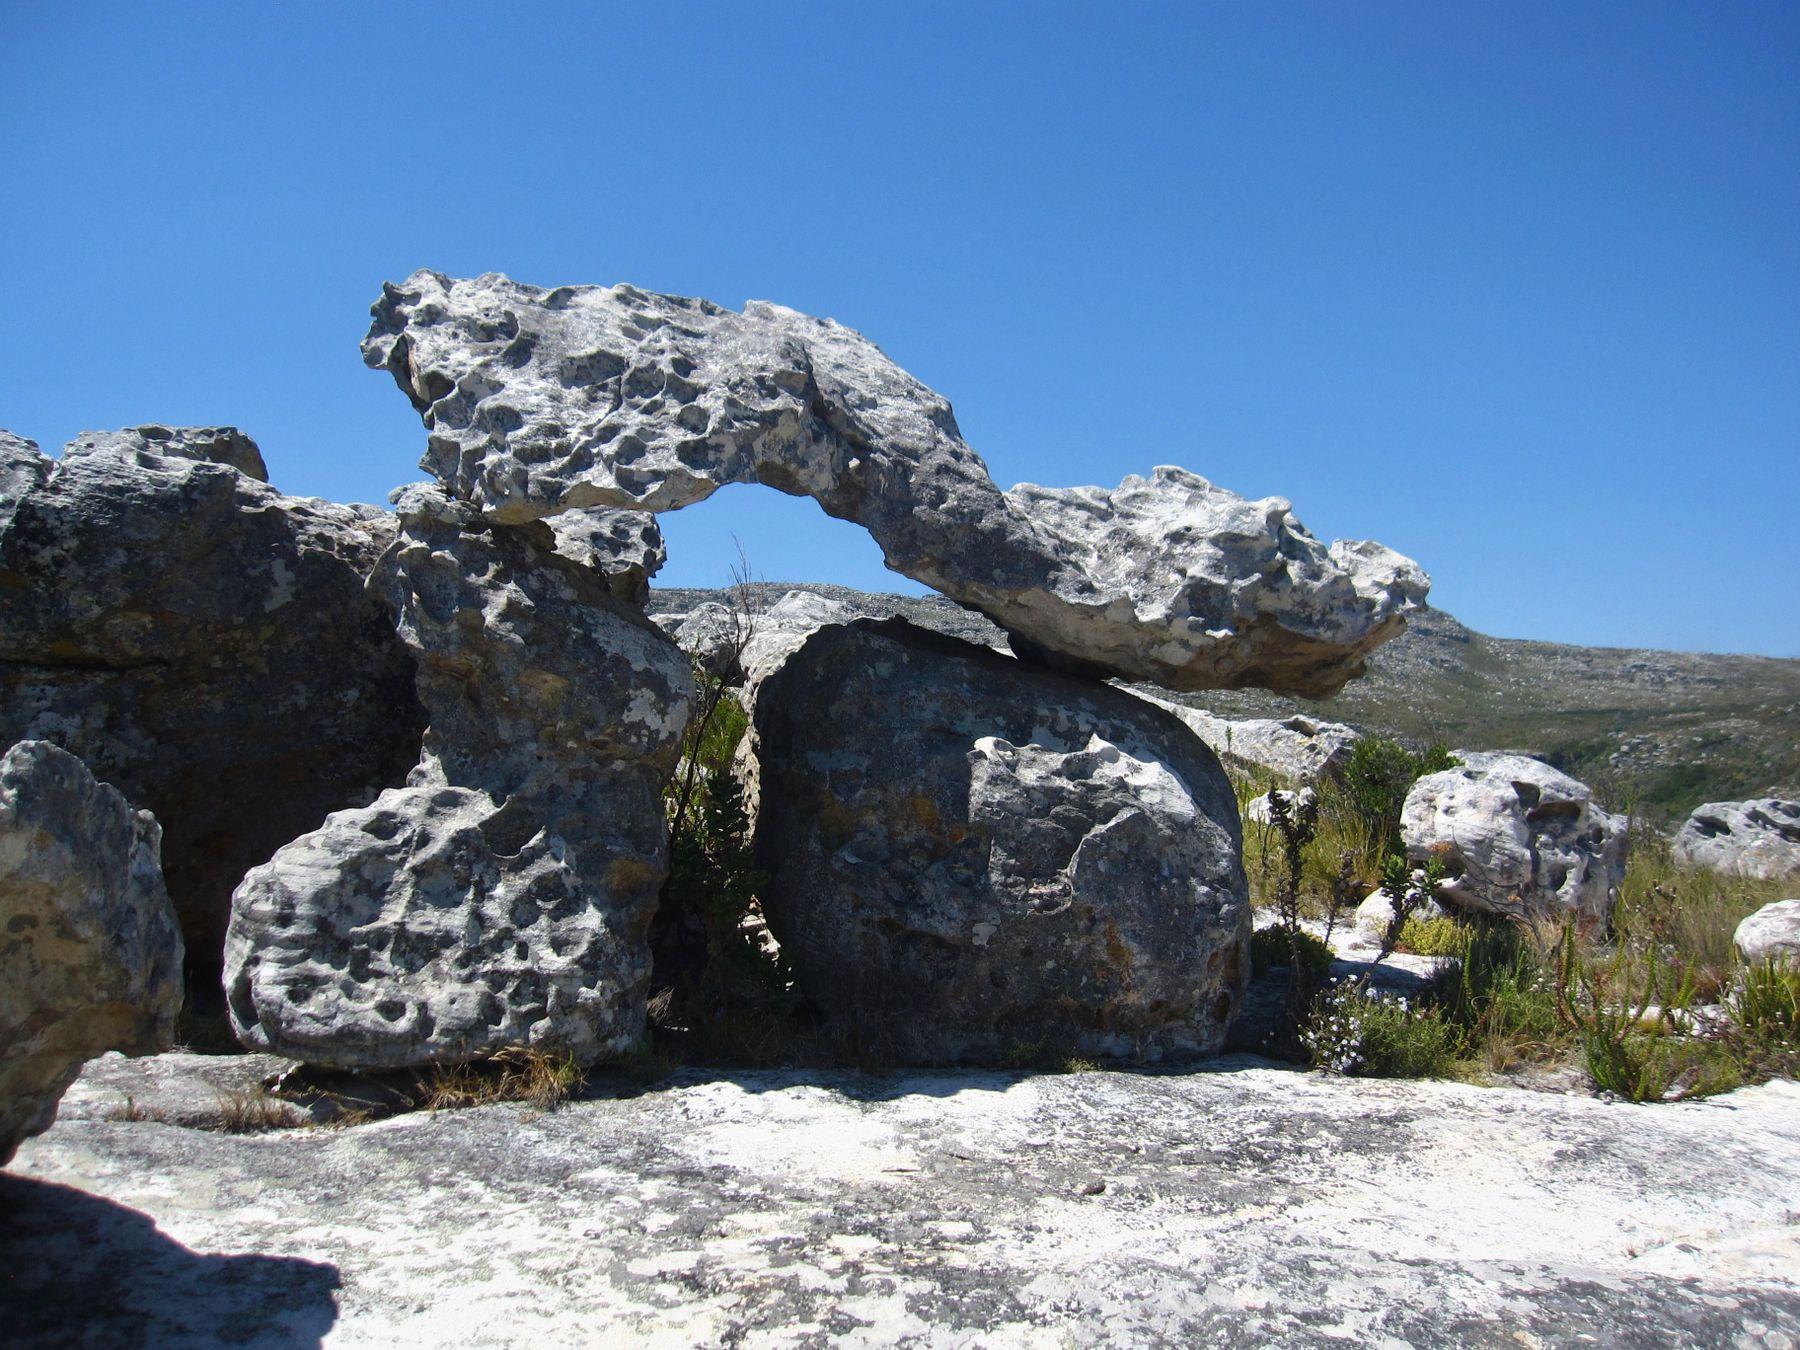 Неведома зверушка. Африка вулкан кратер горы скалы